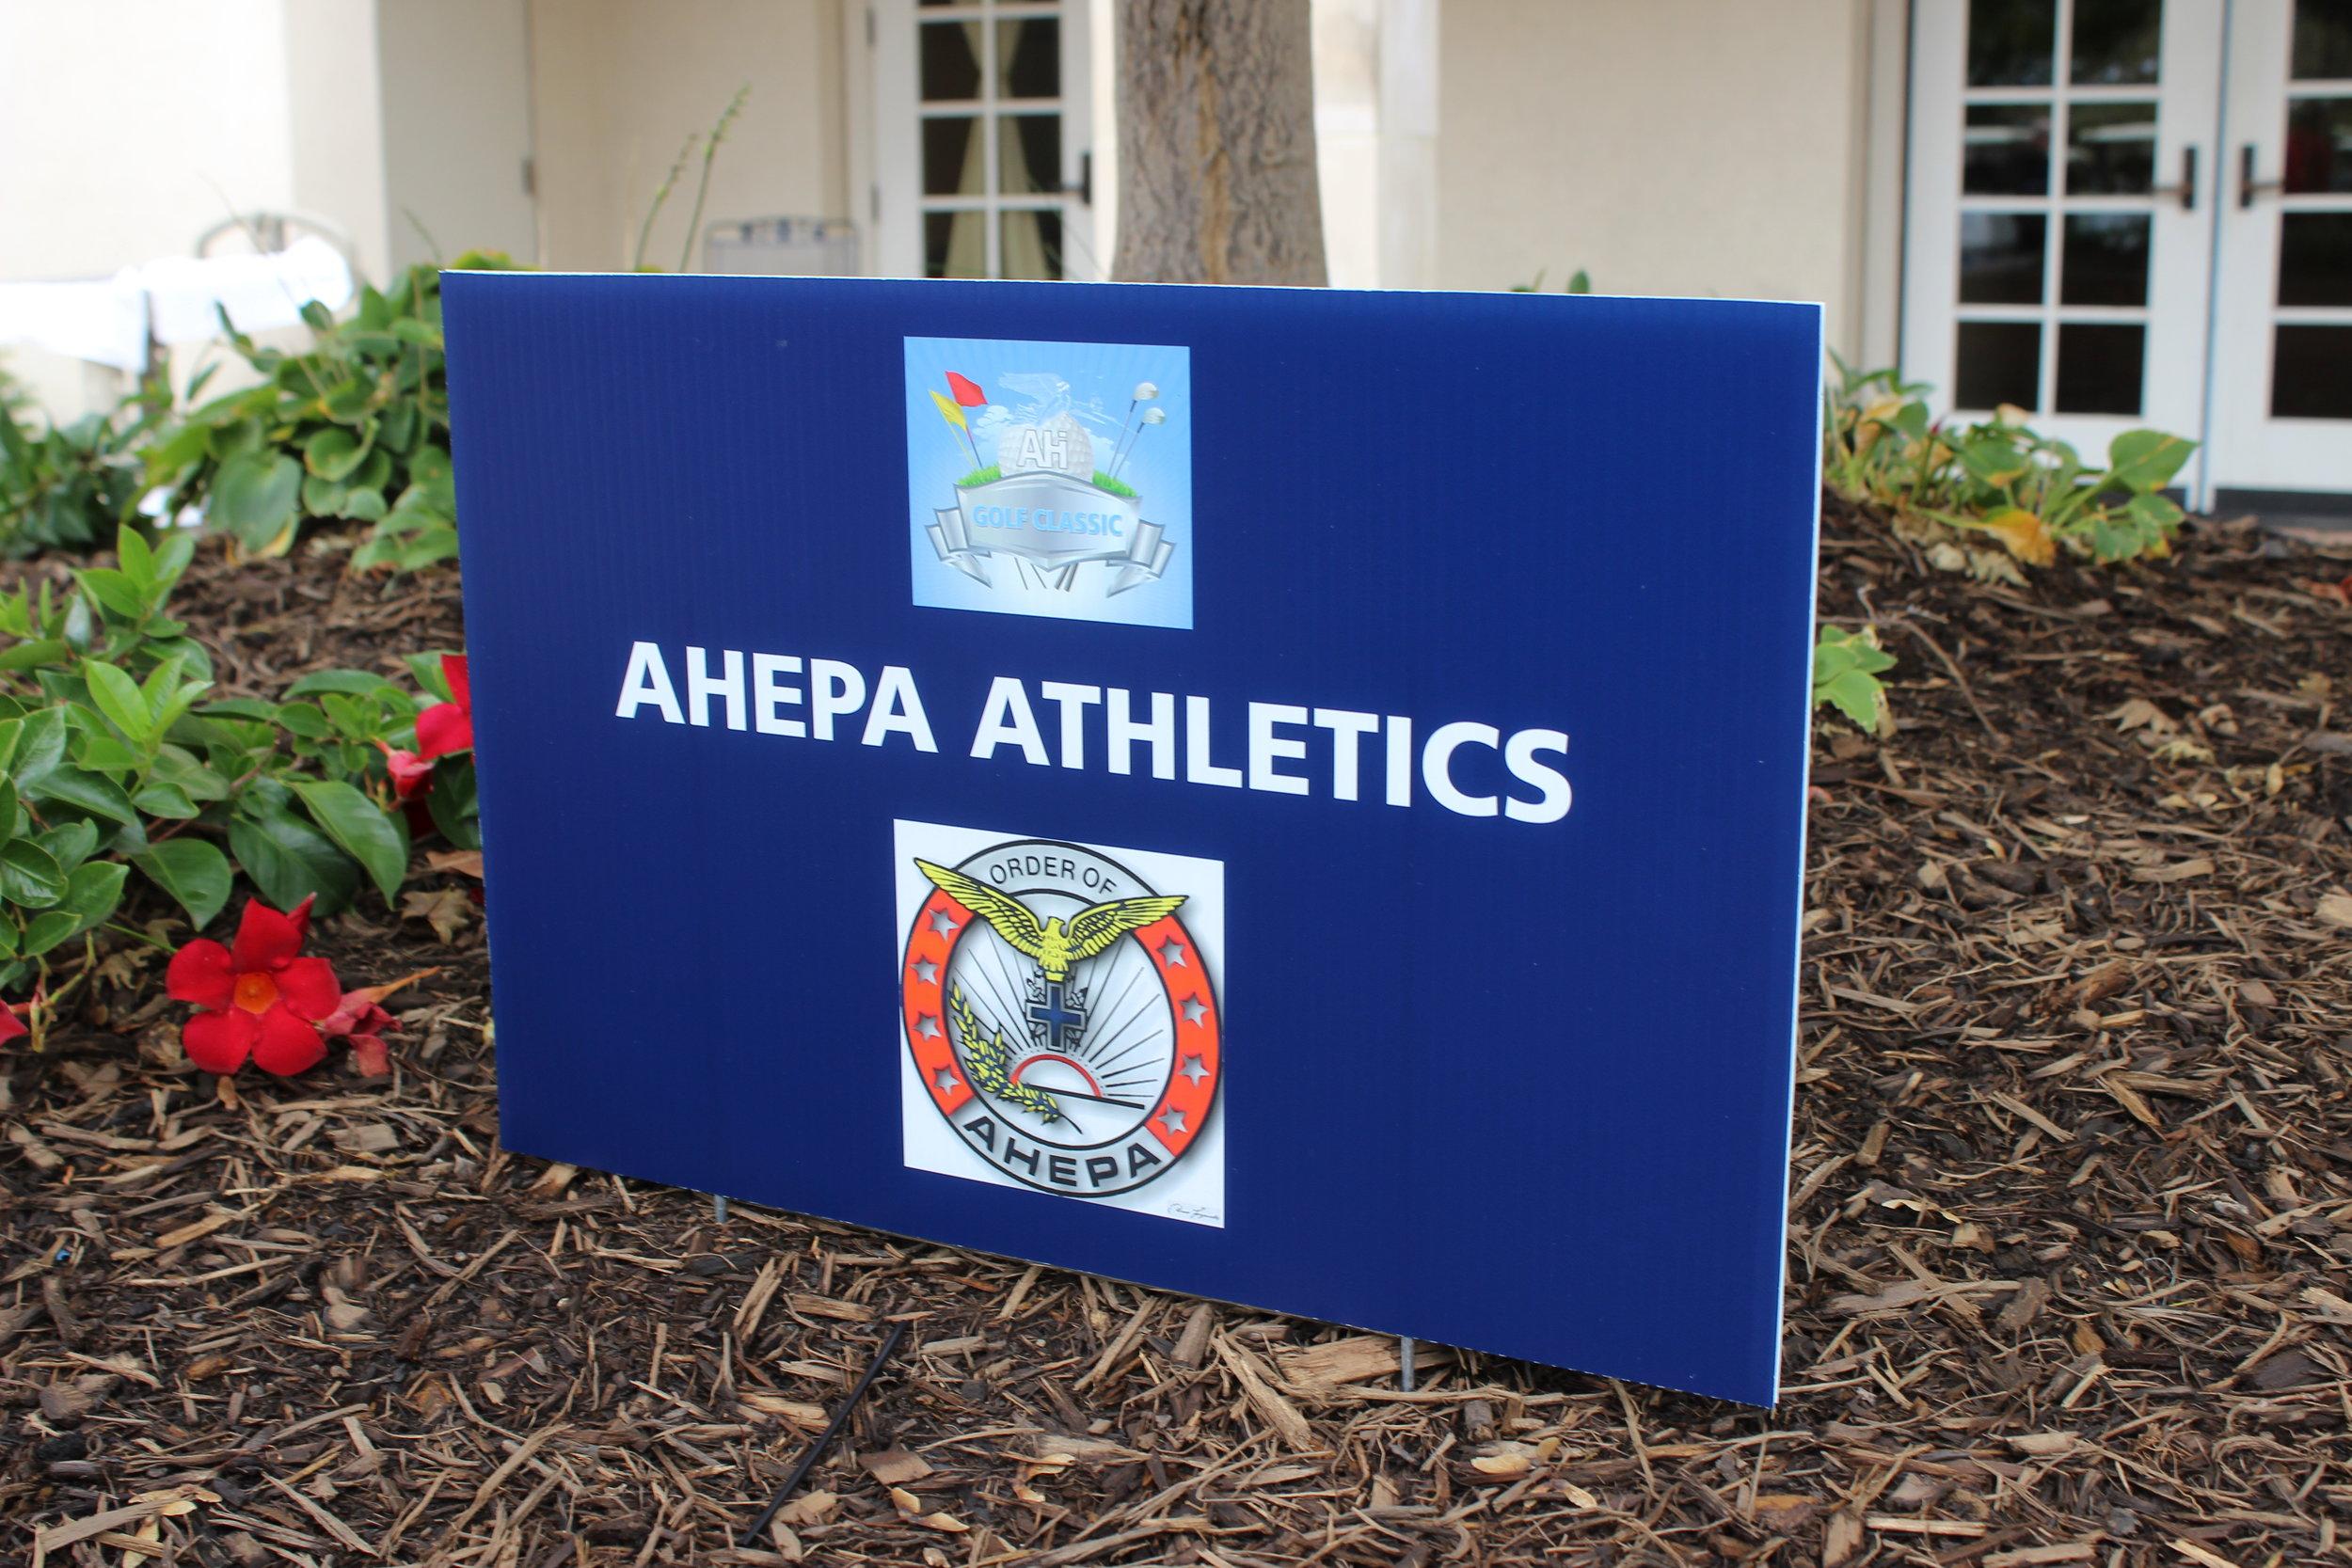 Golf Cart Sponsor, AHEPA Athletics.